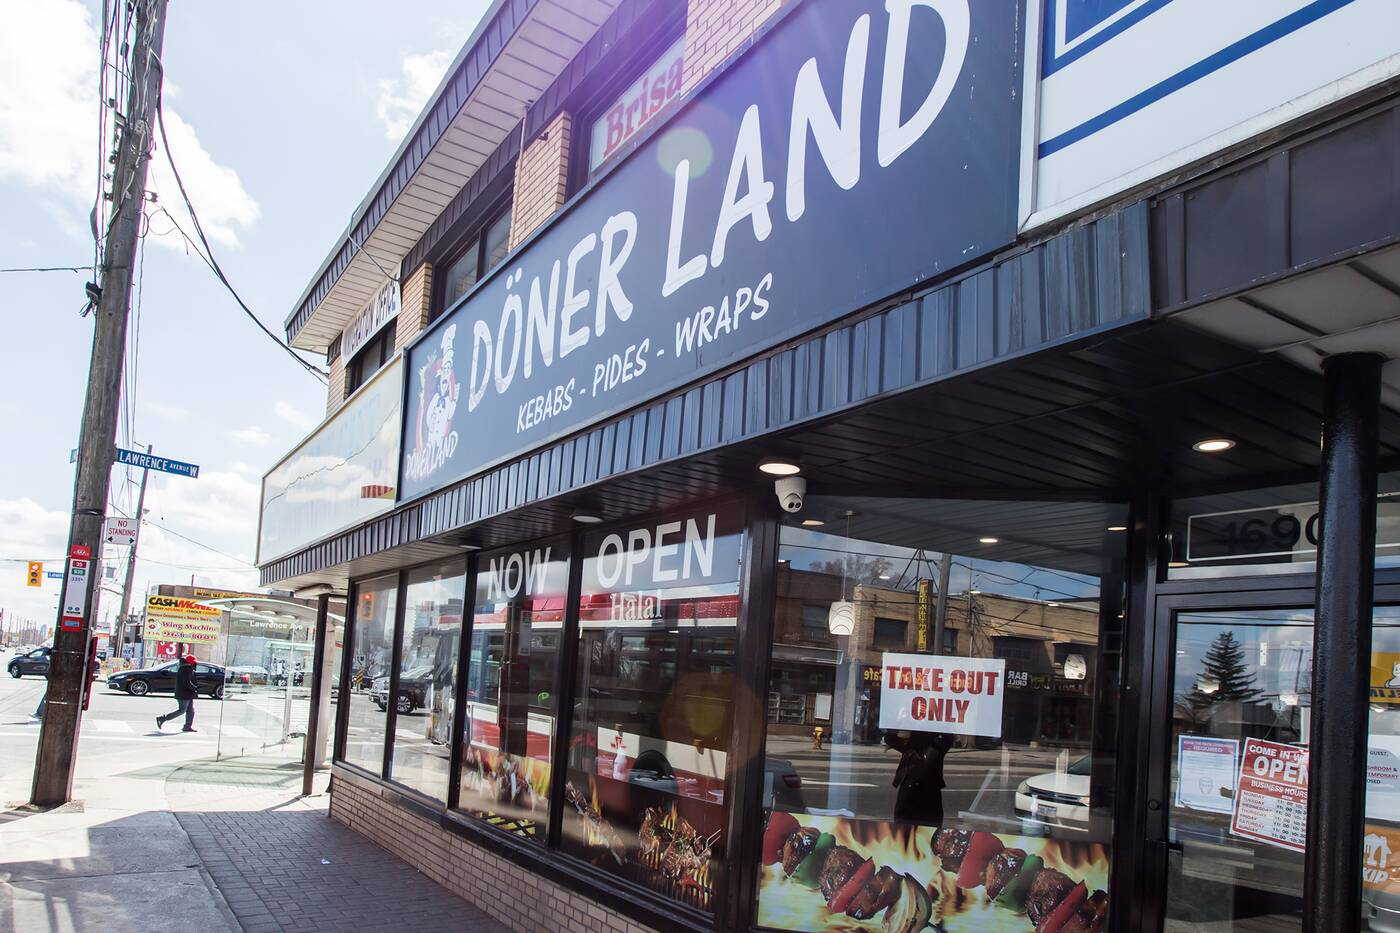 Donerland Toronto